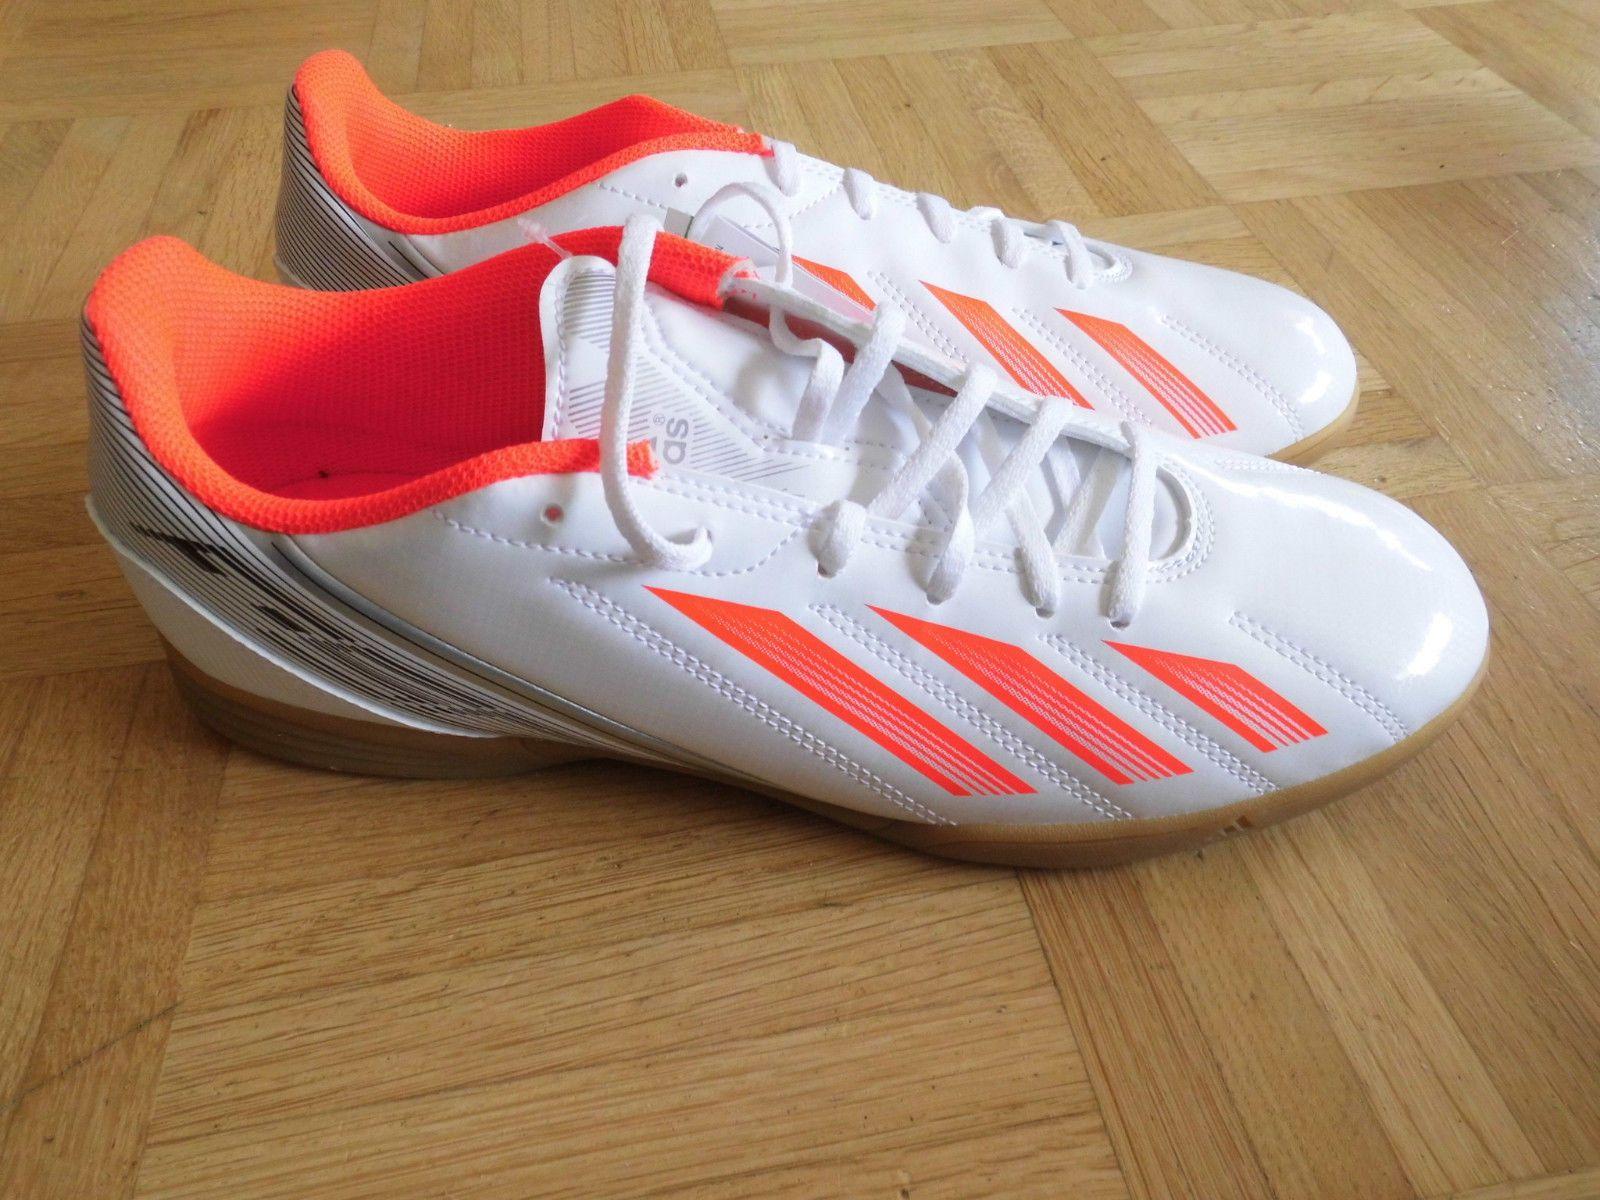 F5 Schuhe 5Eu SportschuheHalleGrUs In Fußball 8 Adidas O8nkX0wP